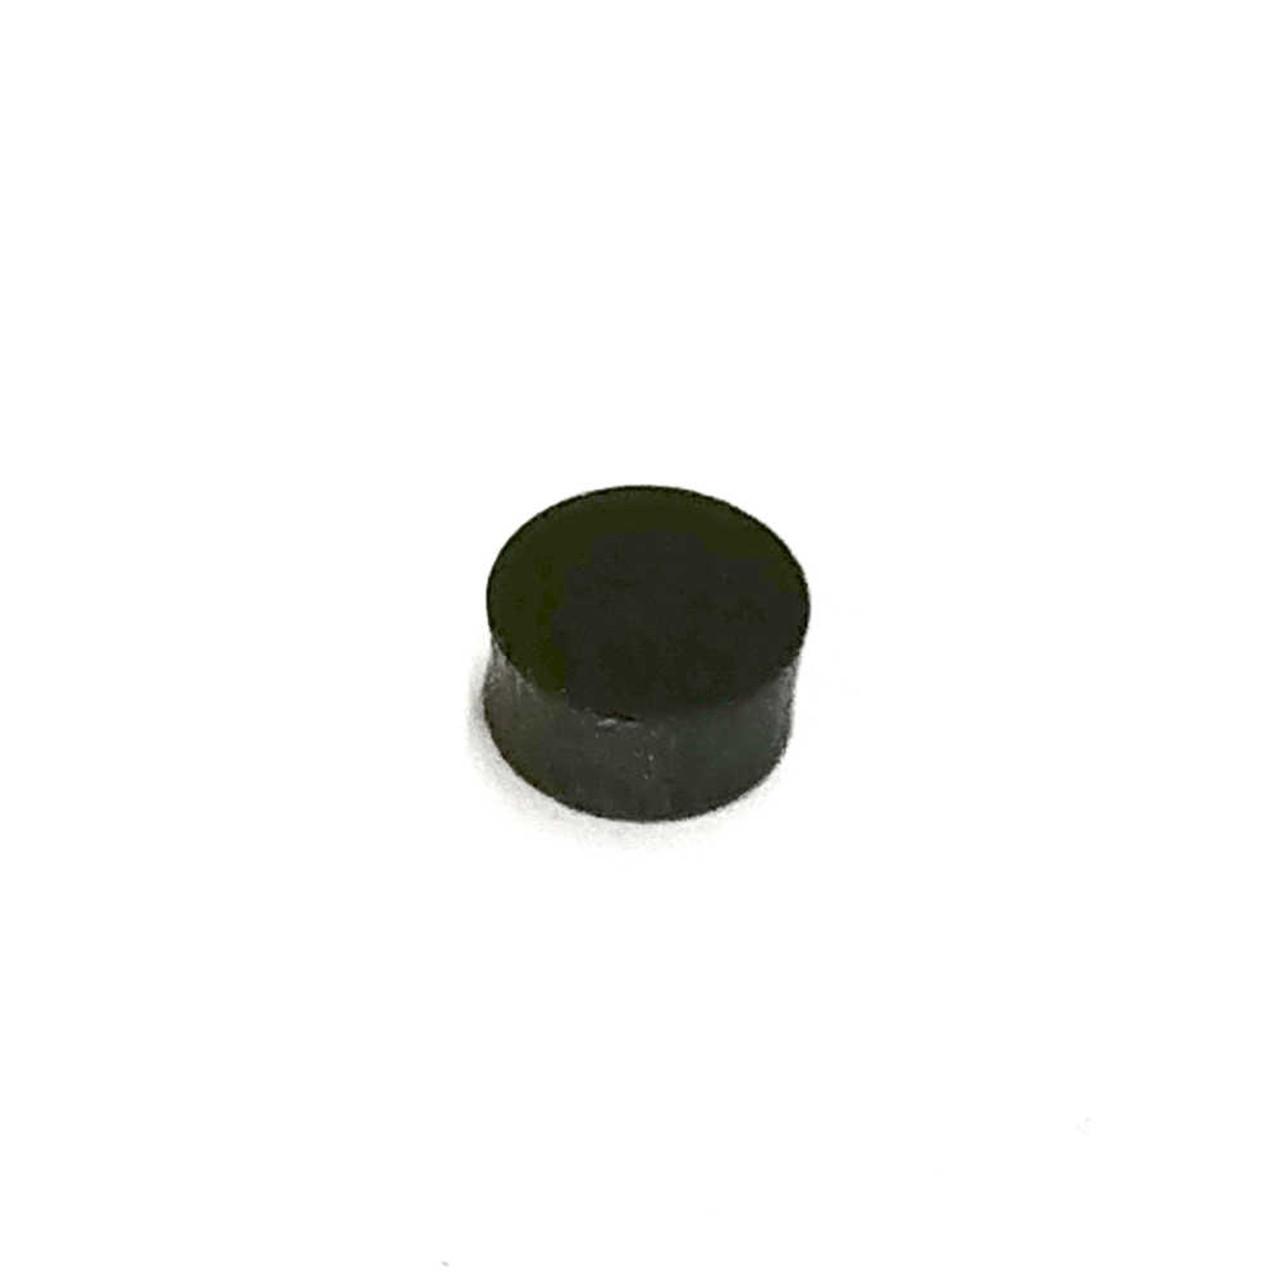 "Inlay Dots - 1/4"" Black (pkg 50)"